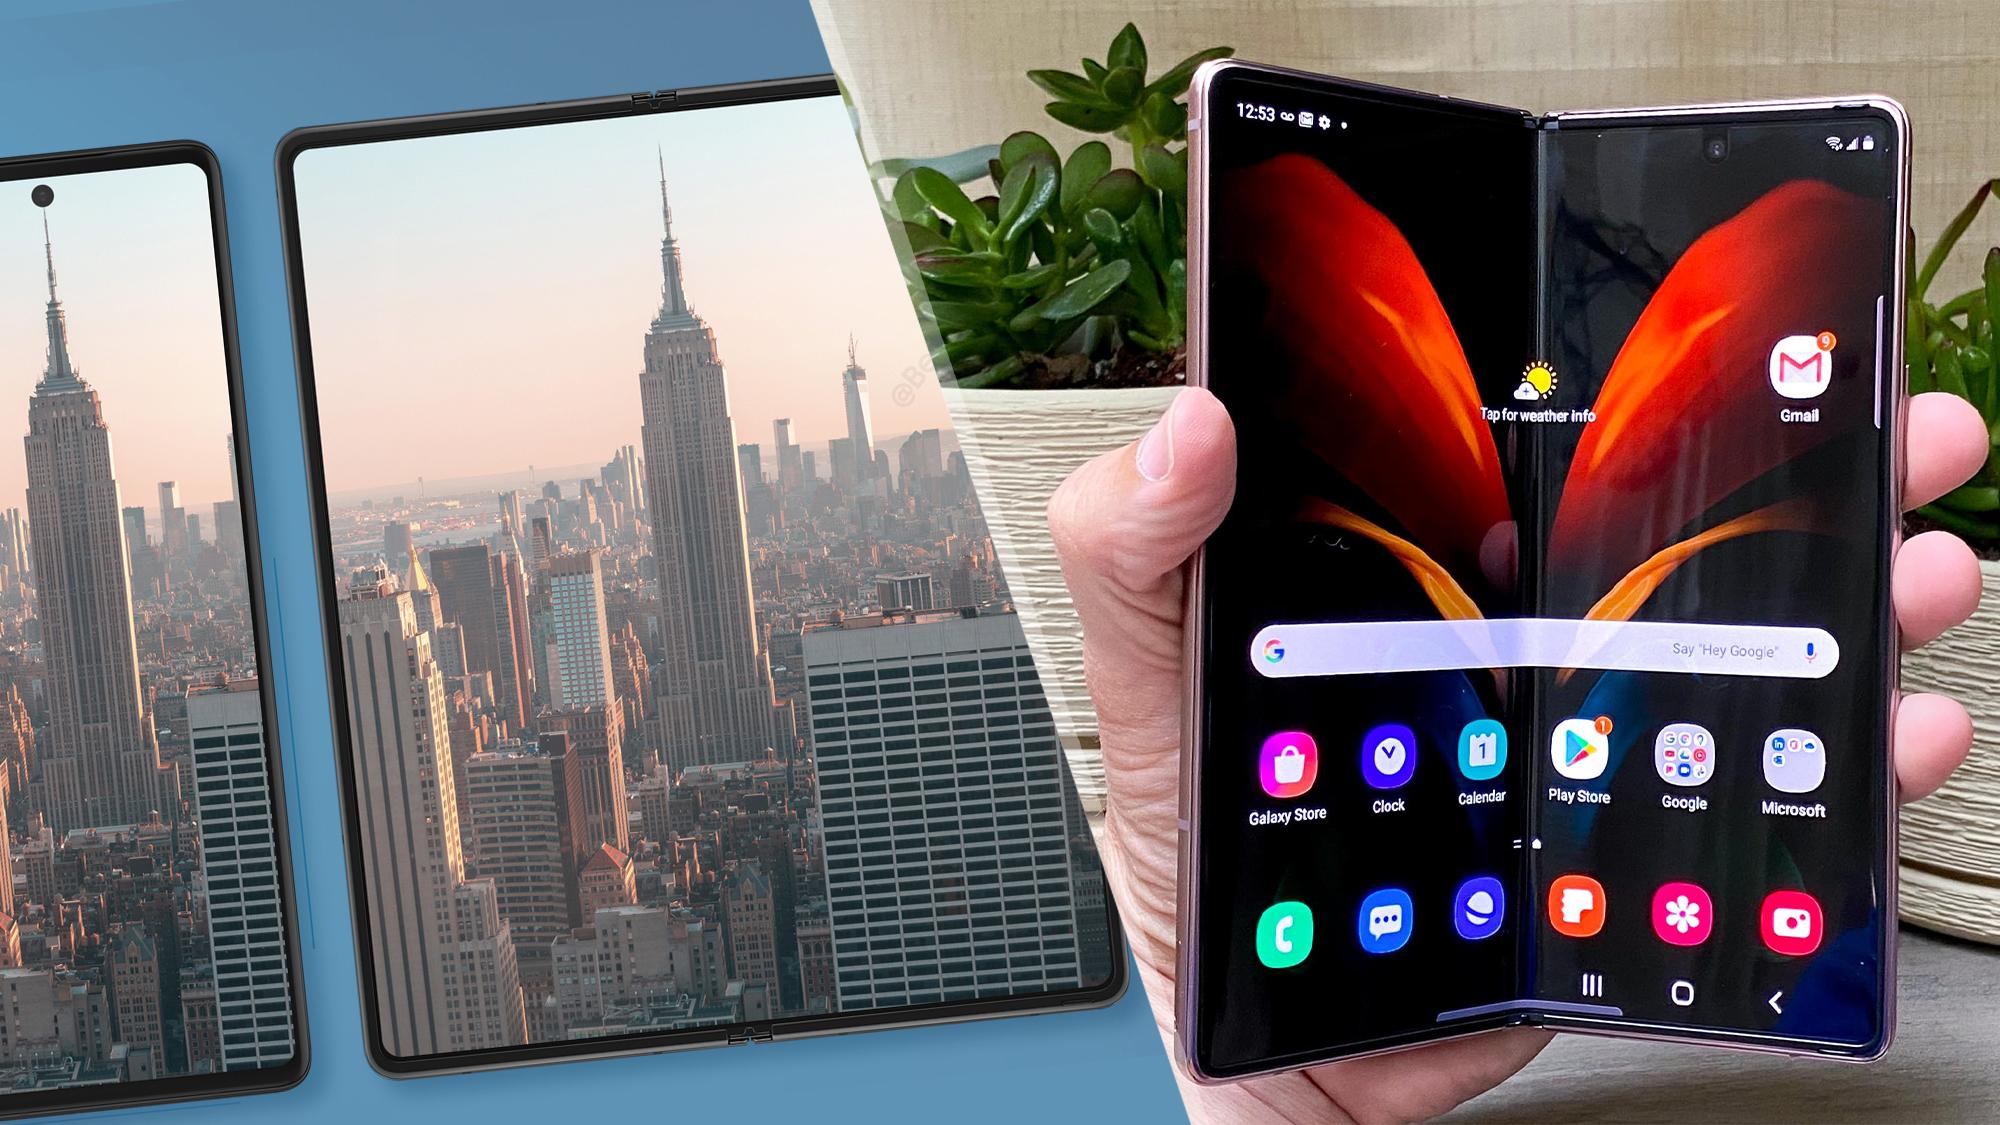 Samsung Galaxy Z Fold 2 vs Samsung Galaxy Z Fold 3